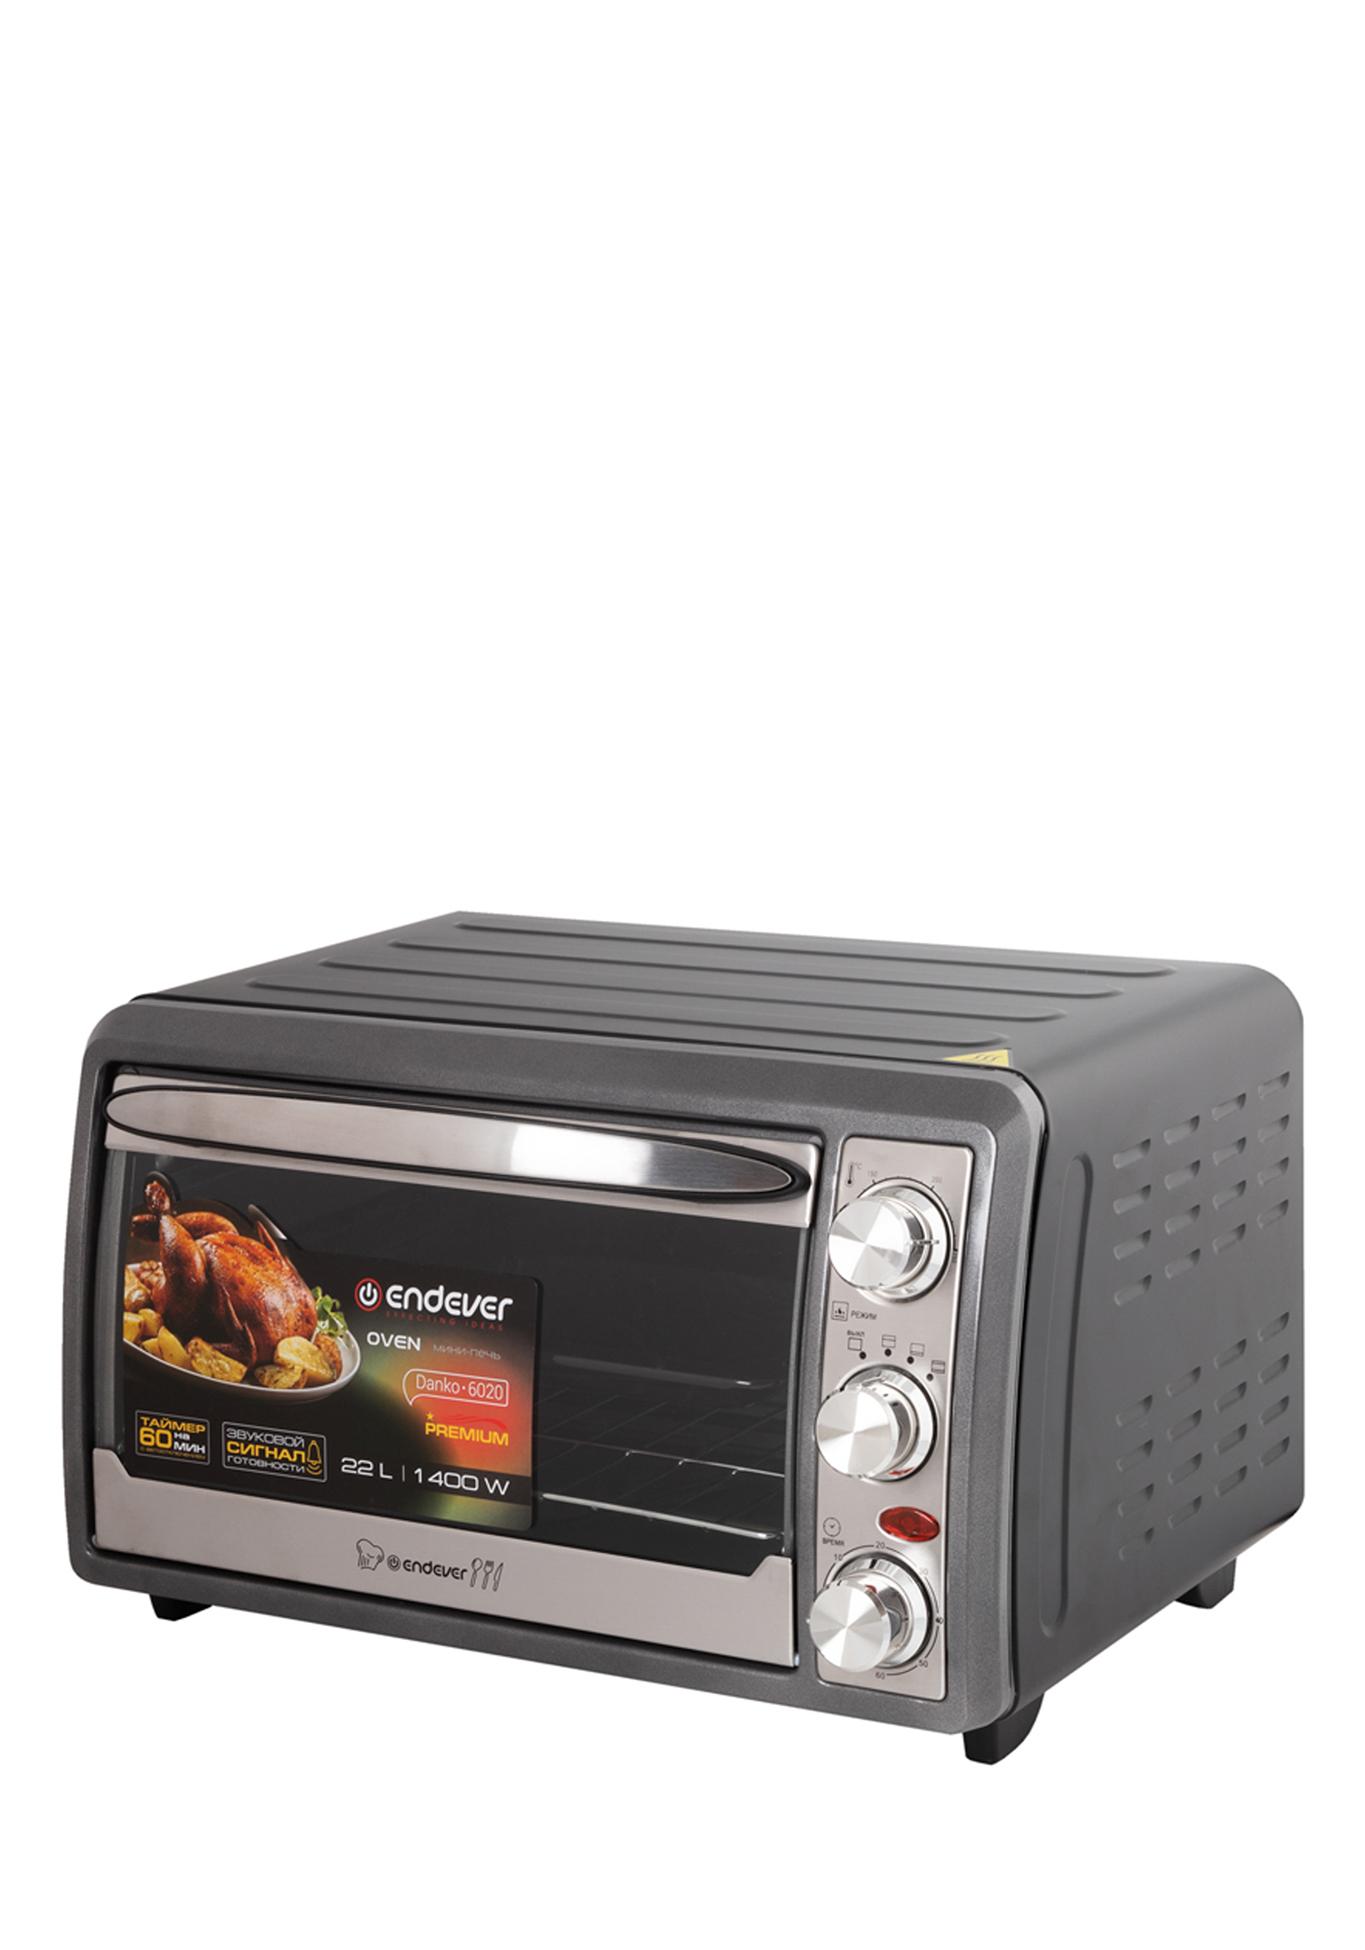 Мини-печь Endever Danko 6020